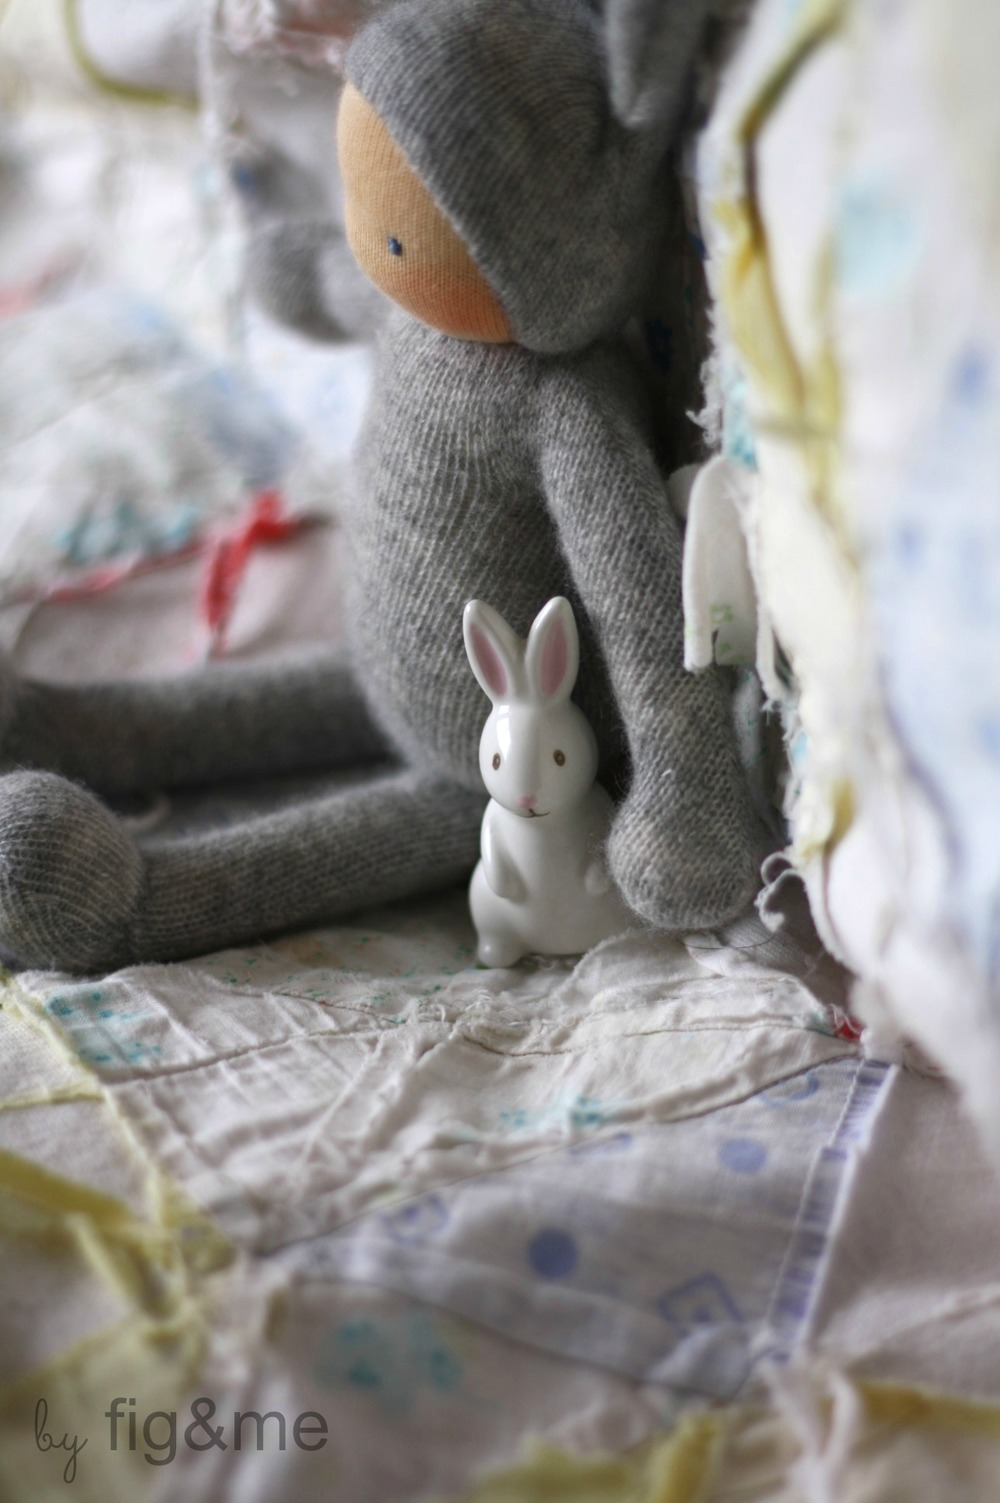 Bunnies-byfigandme.jpg